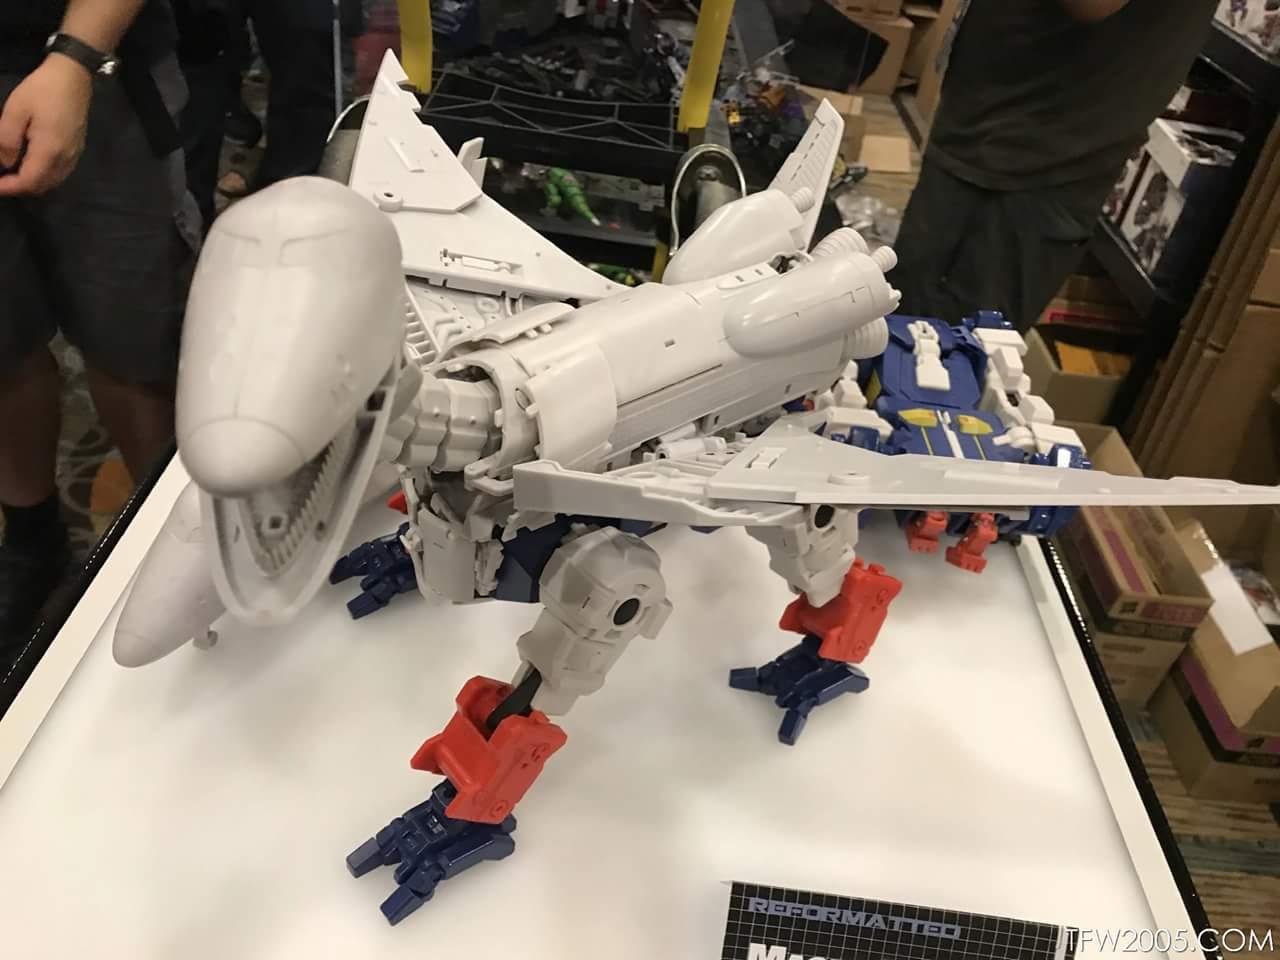 [Mastermind Creations] Produit Tiers - Reformatted Magna Inventa (R-35 Magna et R-36 Inventa) - aka Sky-Lynx/Chaînon OljEfbeo_o